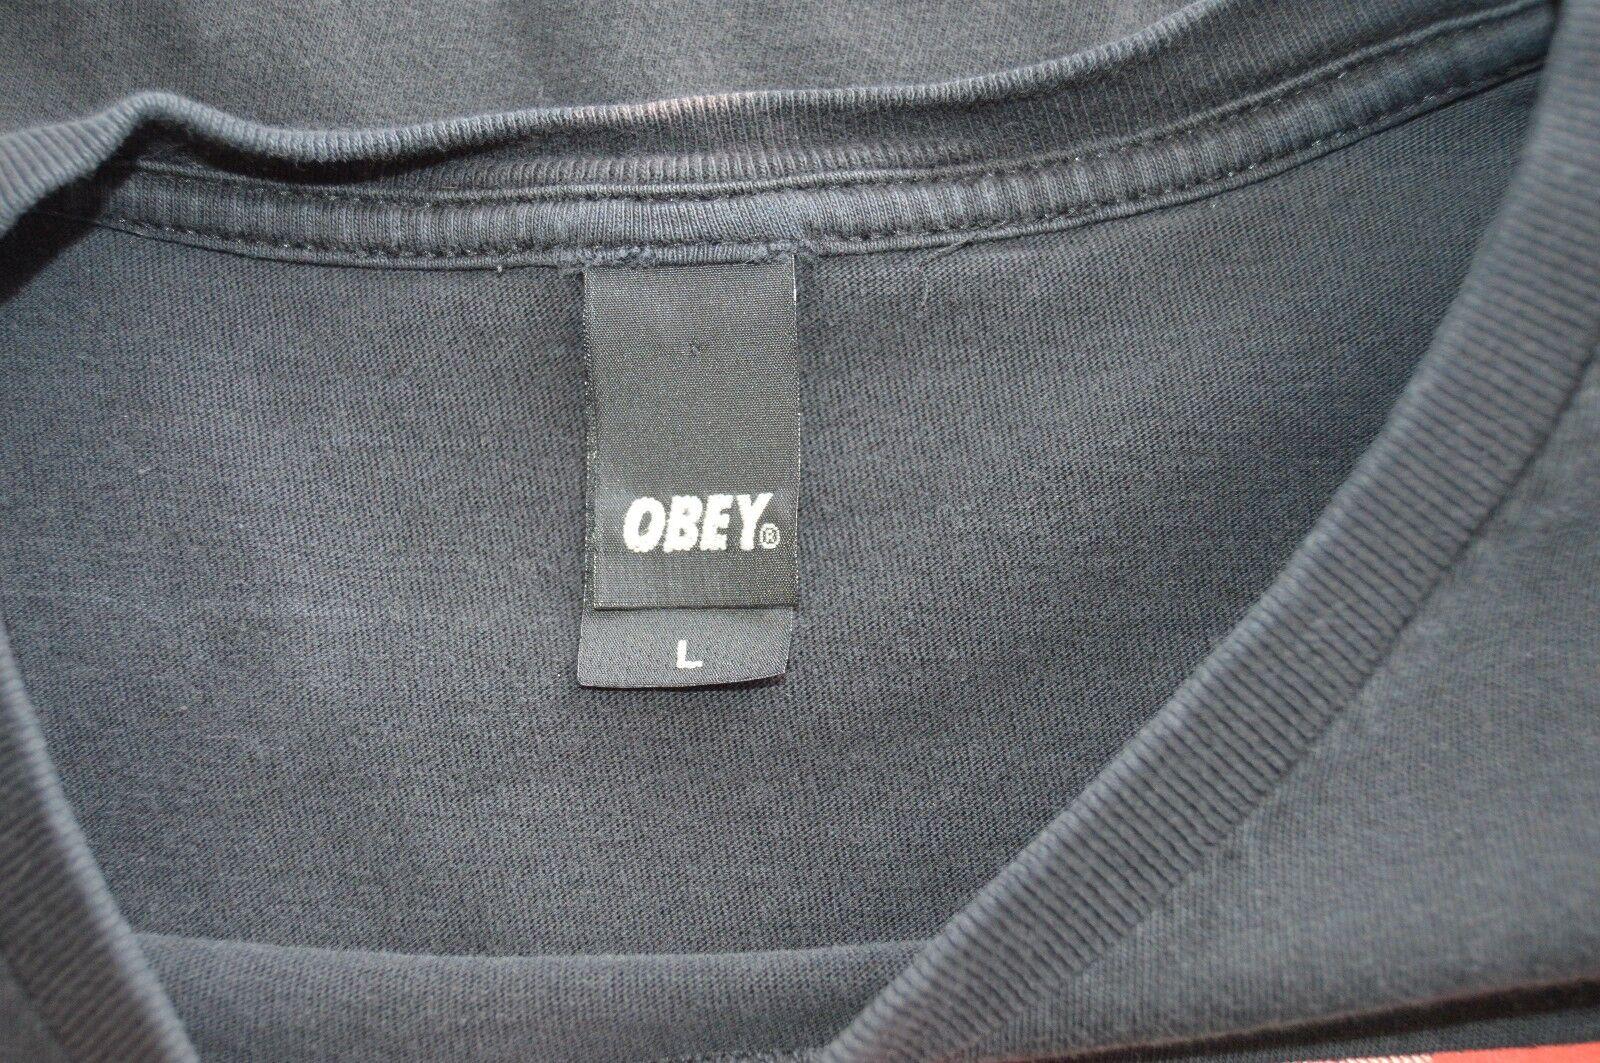 Obey Woman Military Cap Uniform Peace Dove Mens L Black